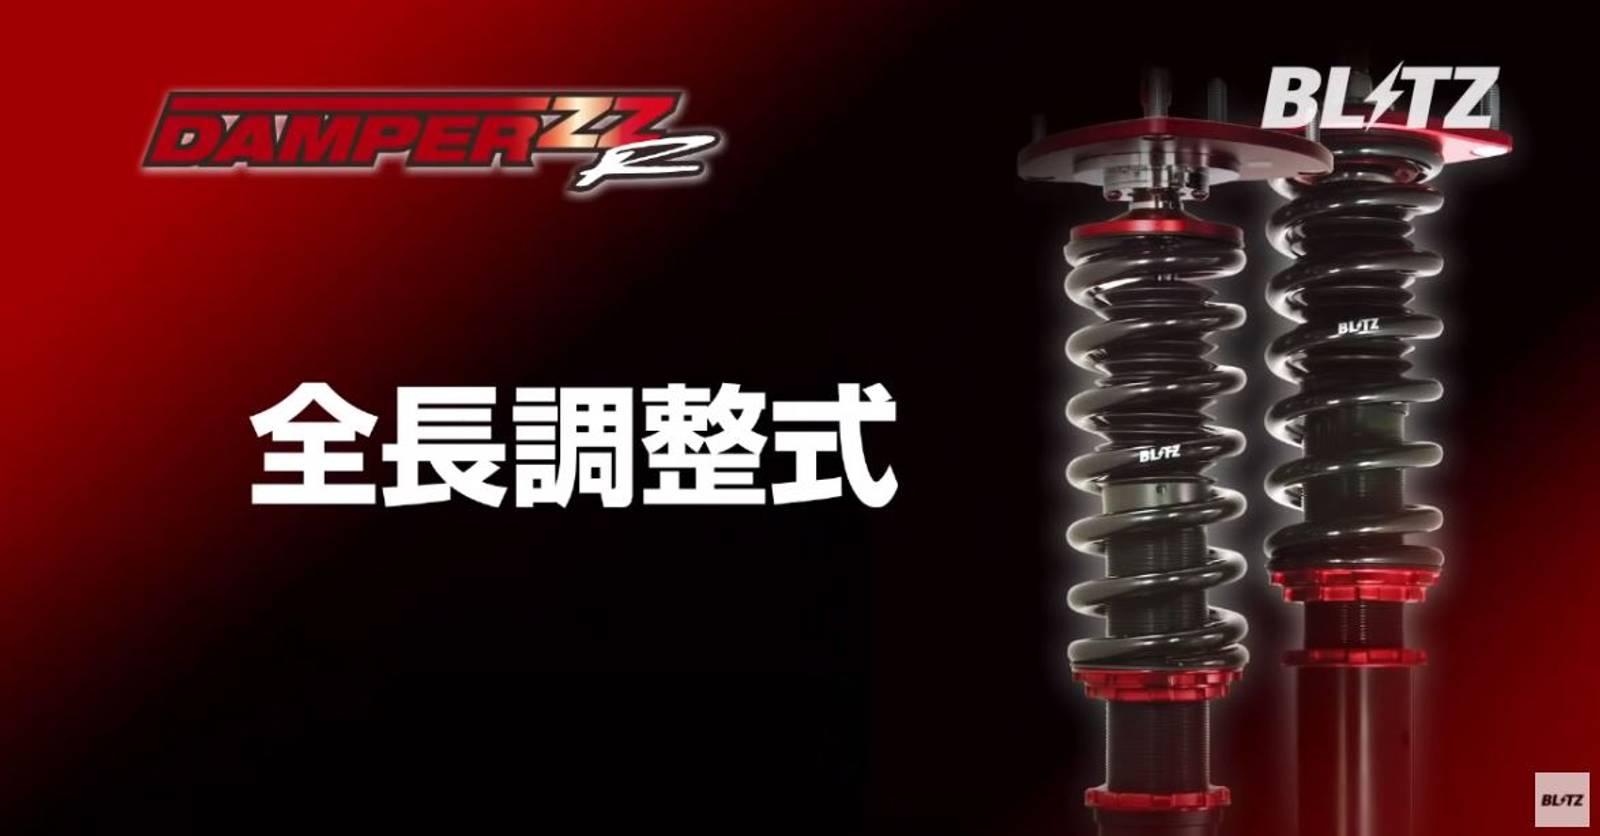 Blitz Damper ZZ-R Coilover Suspension Kit Fits Nissan Cube (Z12)